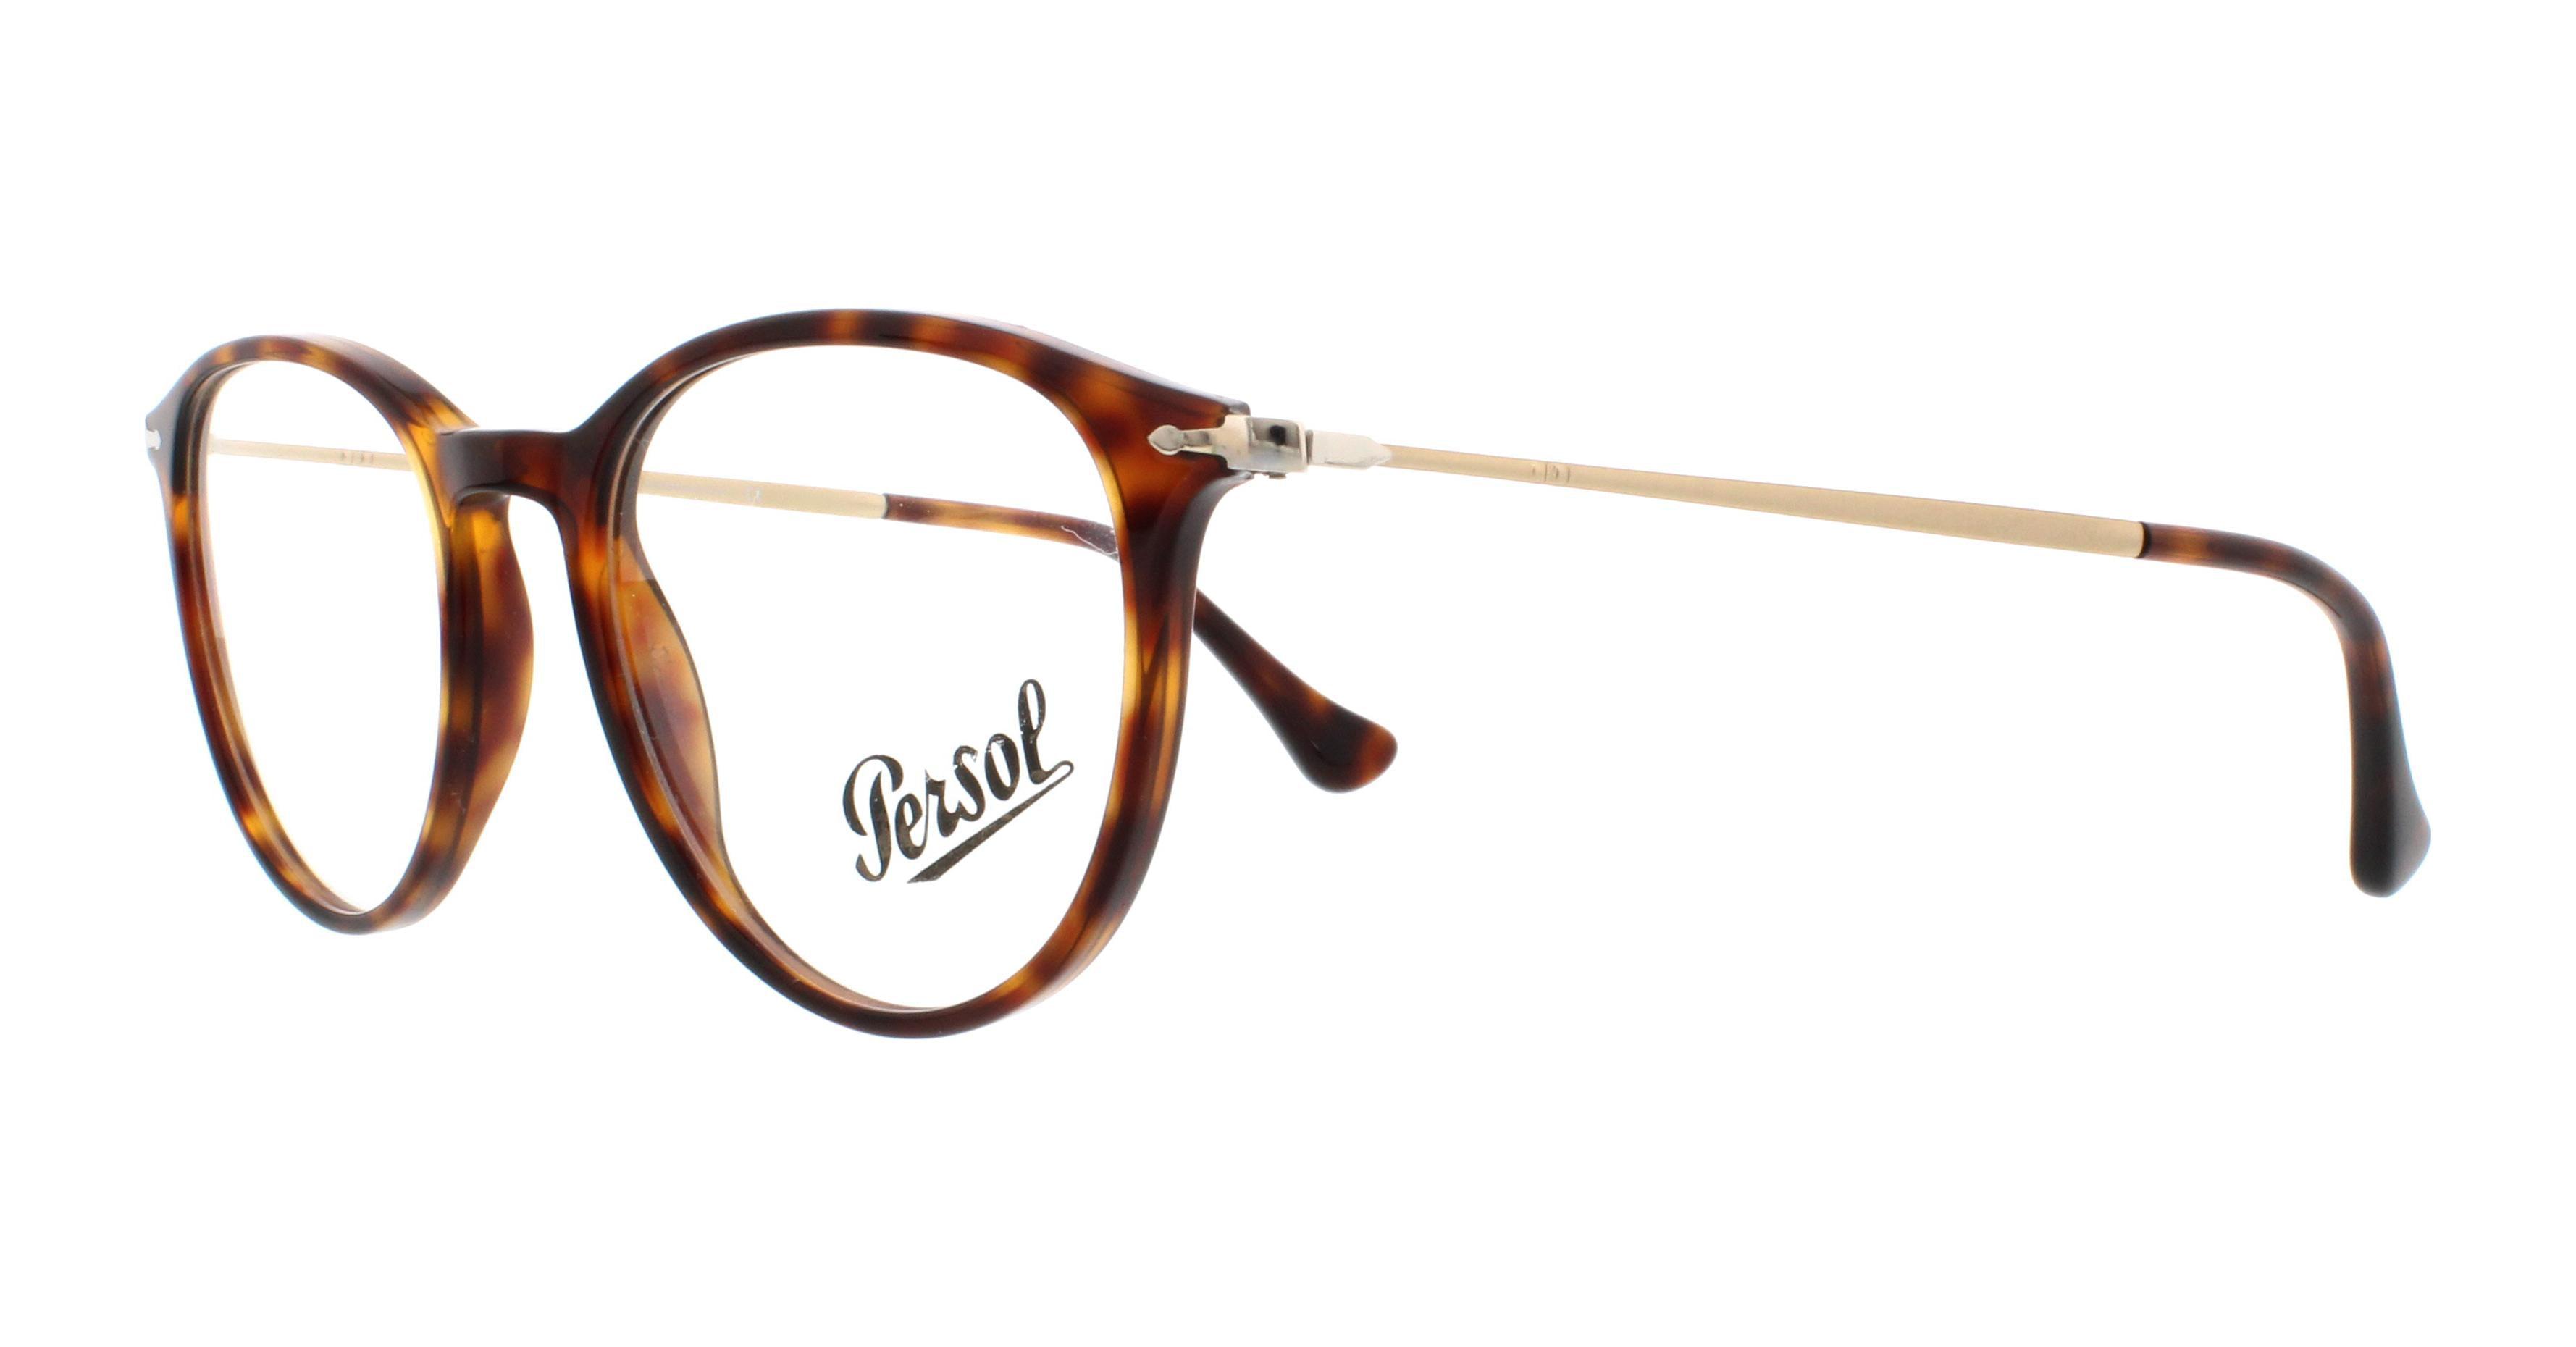 ed8e3db497e1 PERSOL Eyeglasses PO 3147V 24 Havana 48MM - Walmart.com